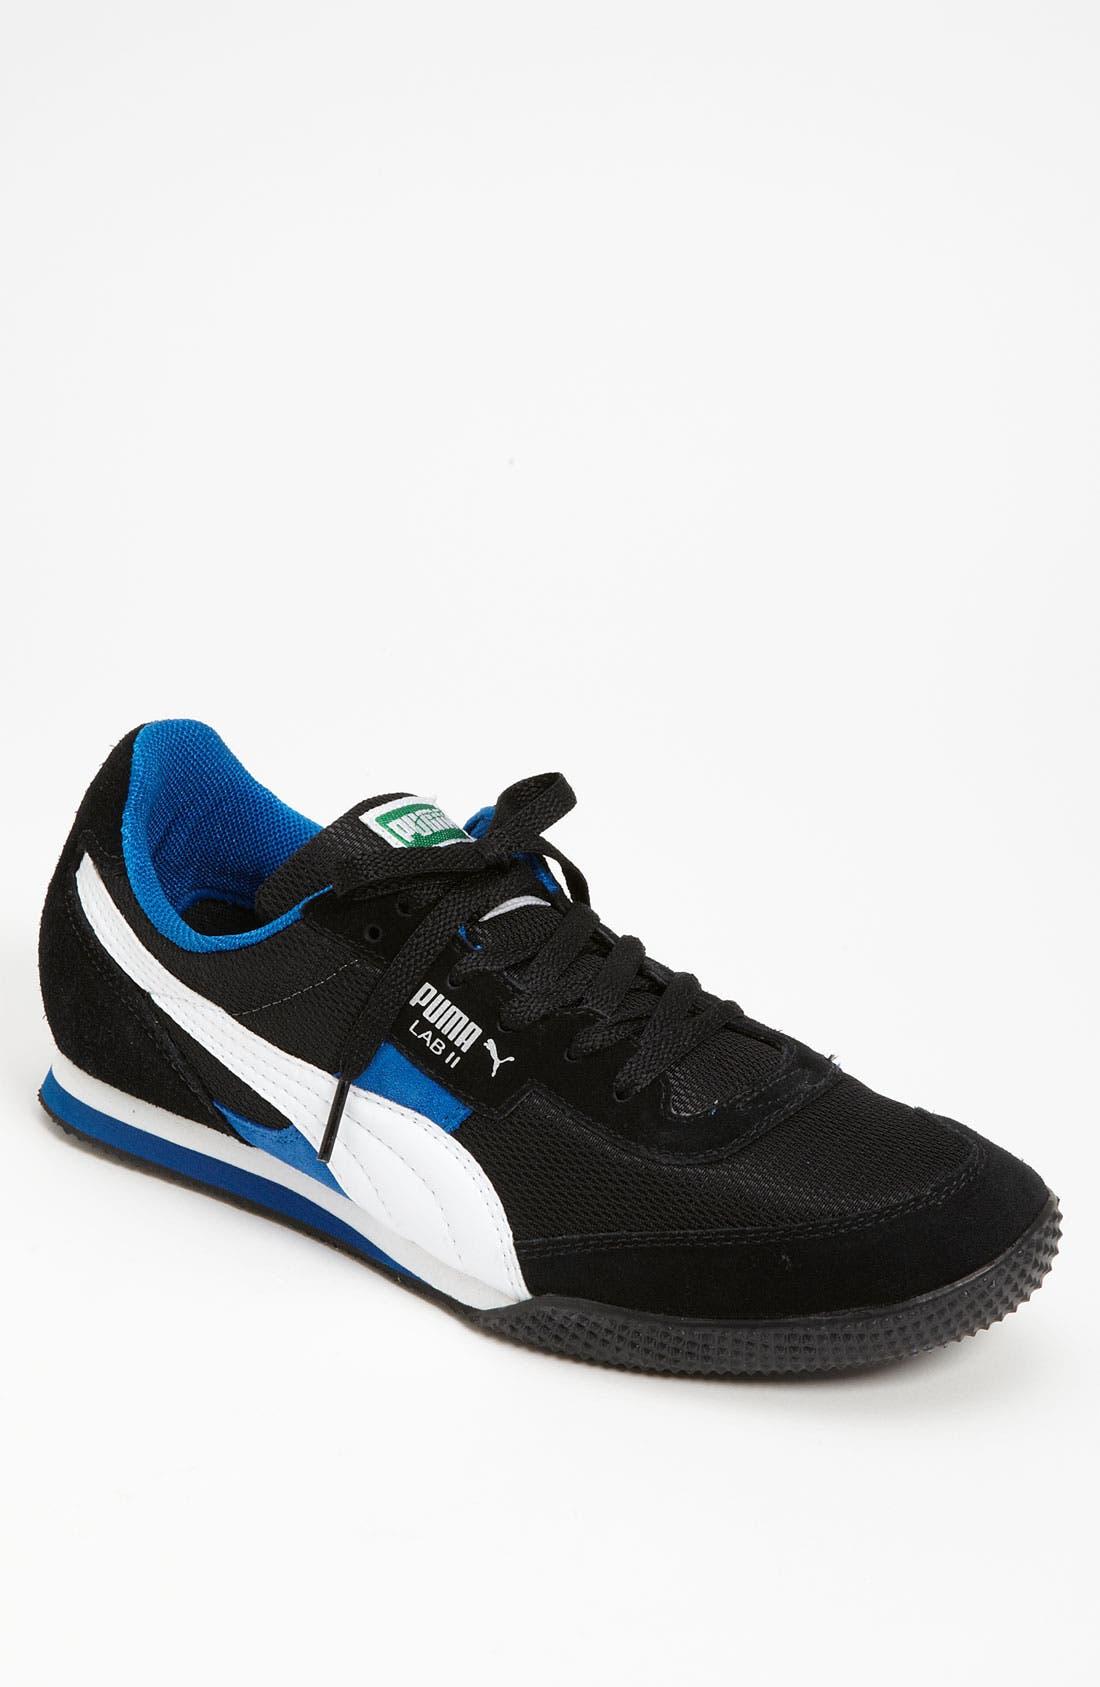 PUMA,                             'Lab II FB' Sneaker,                             Main thumbnail 1, color,                             001